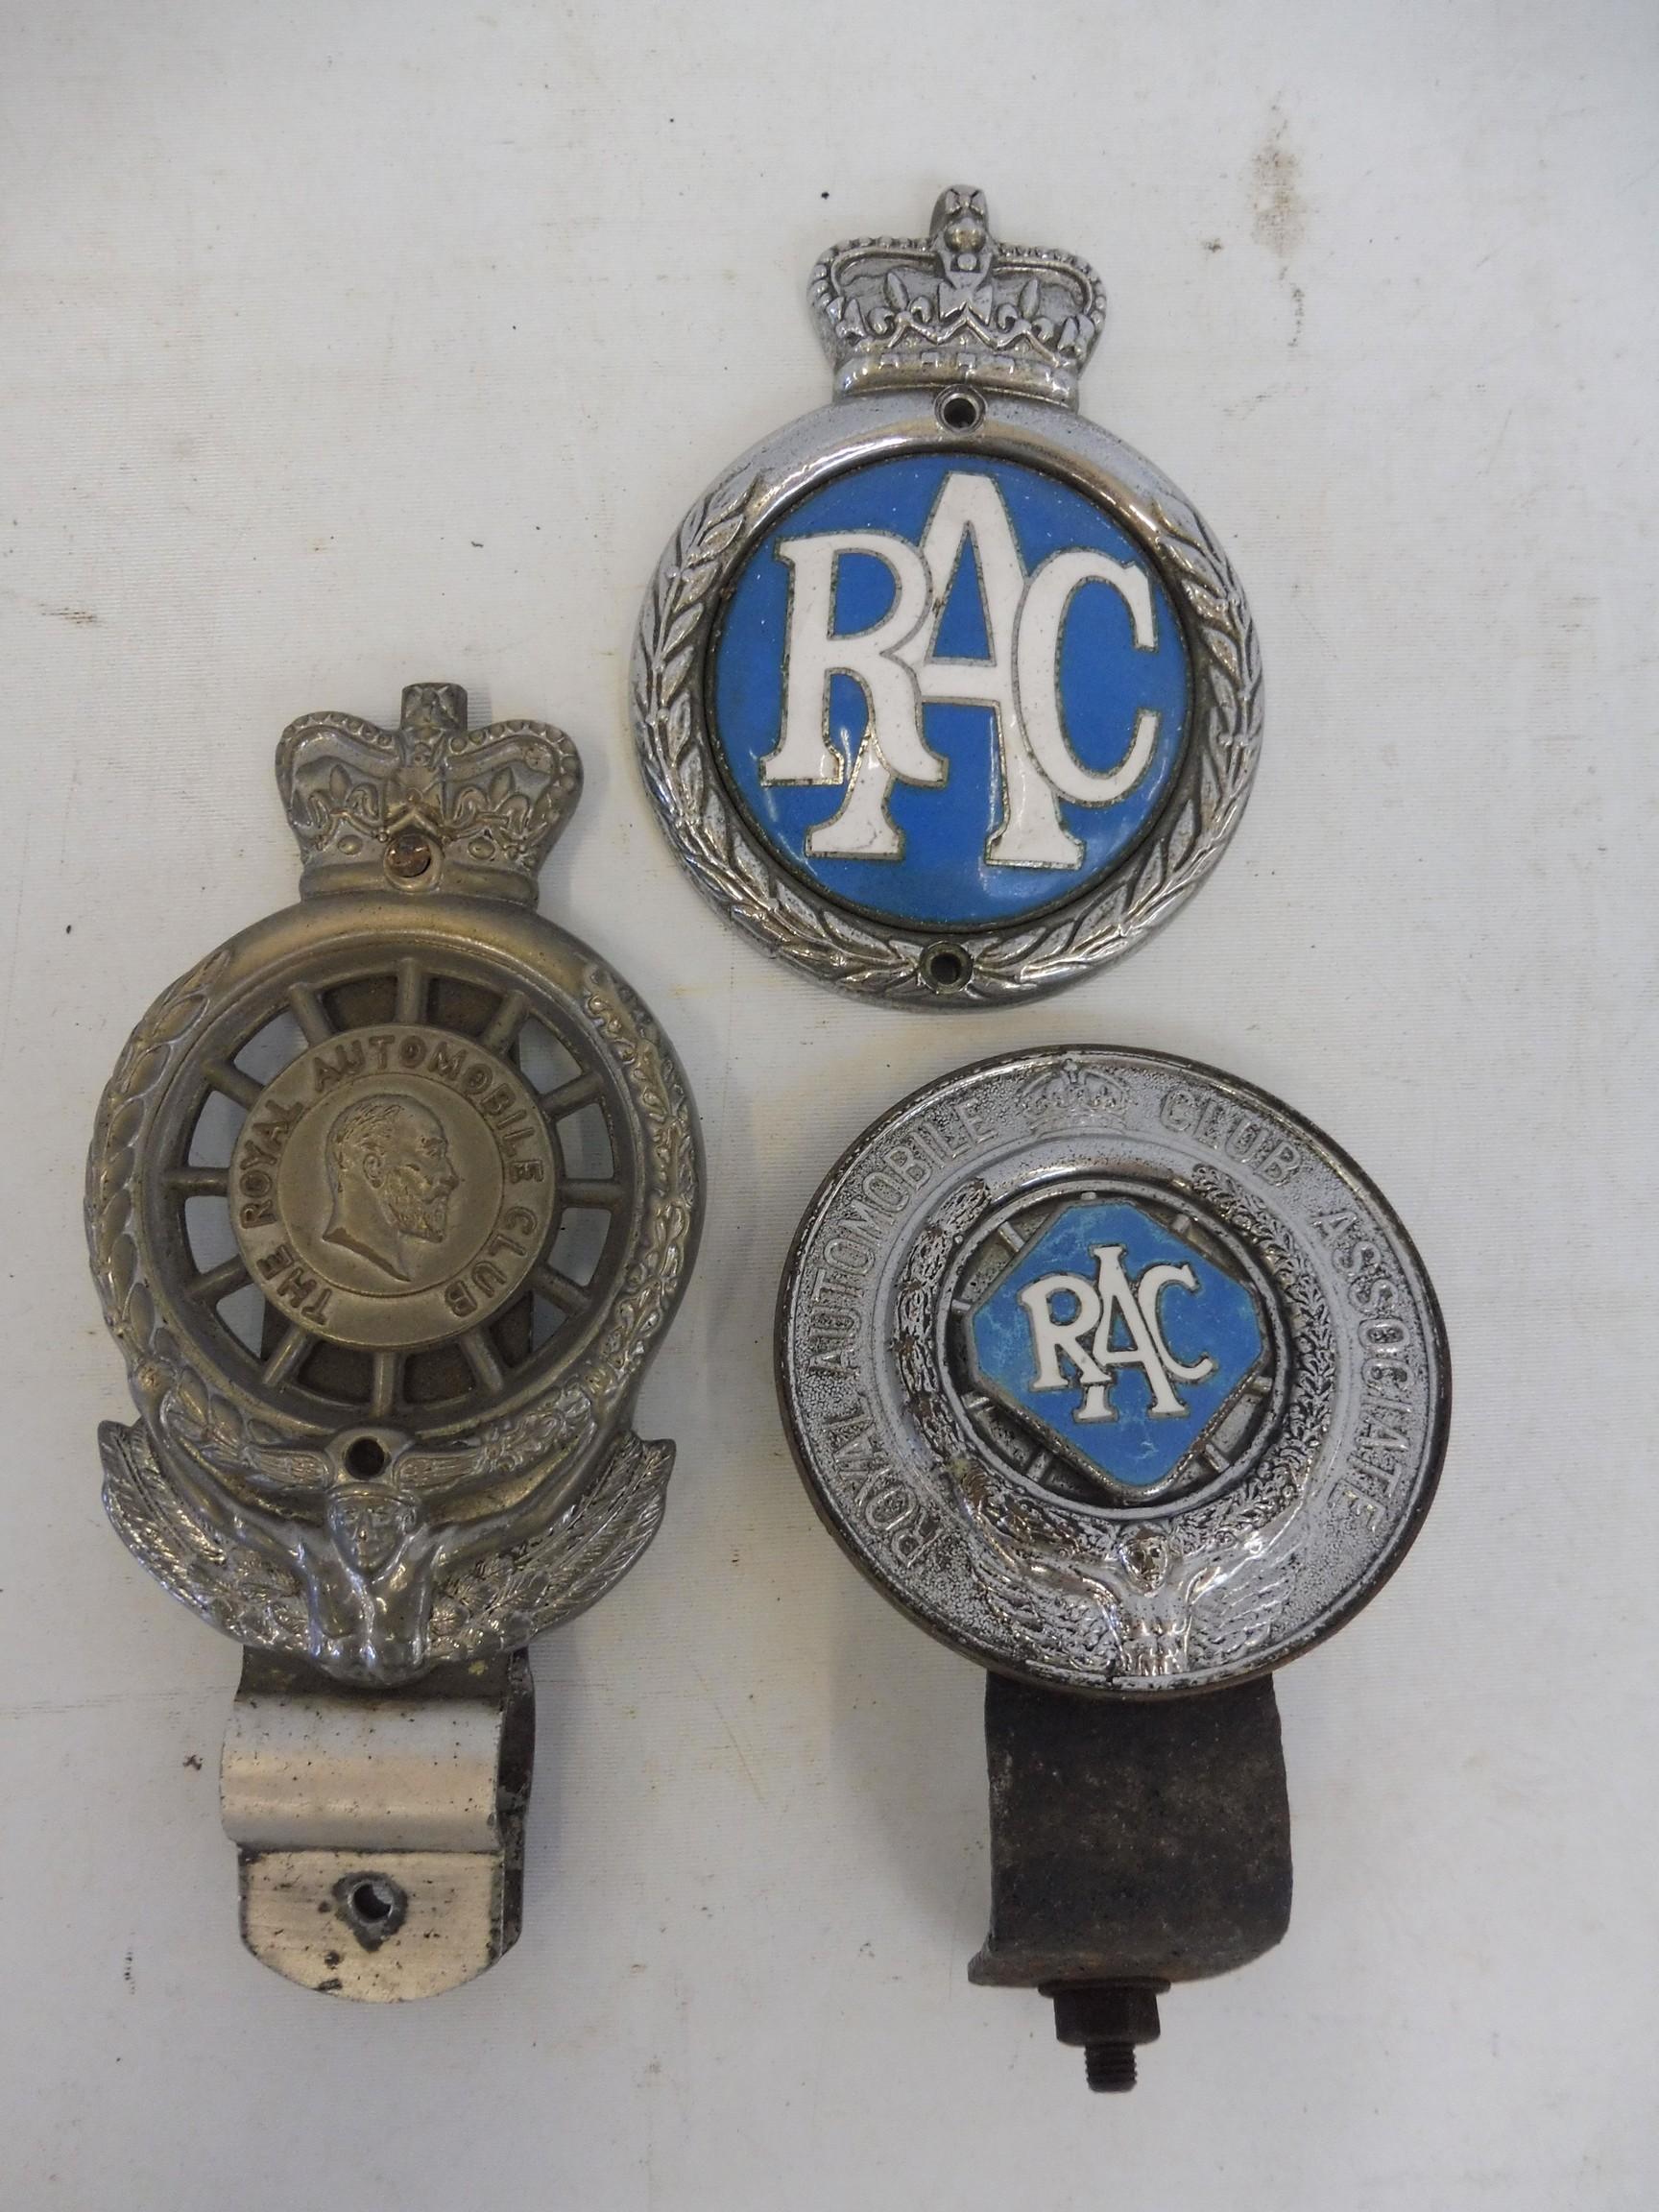 Three early RAC car badges.